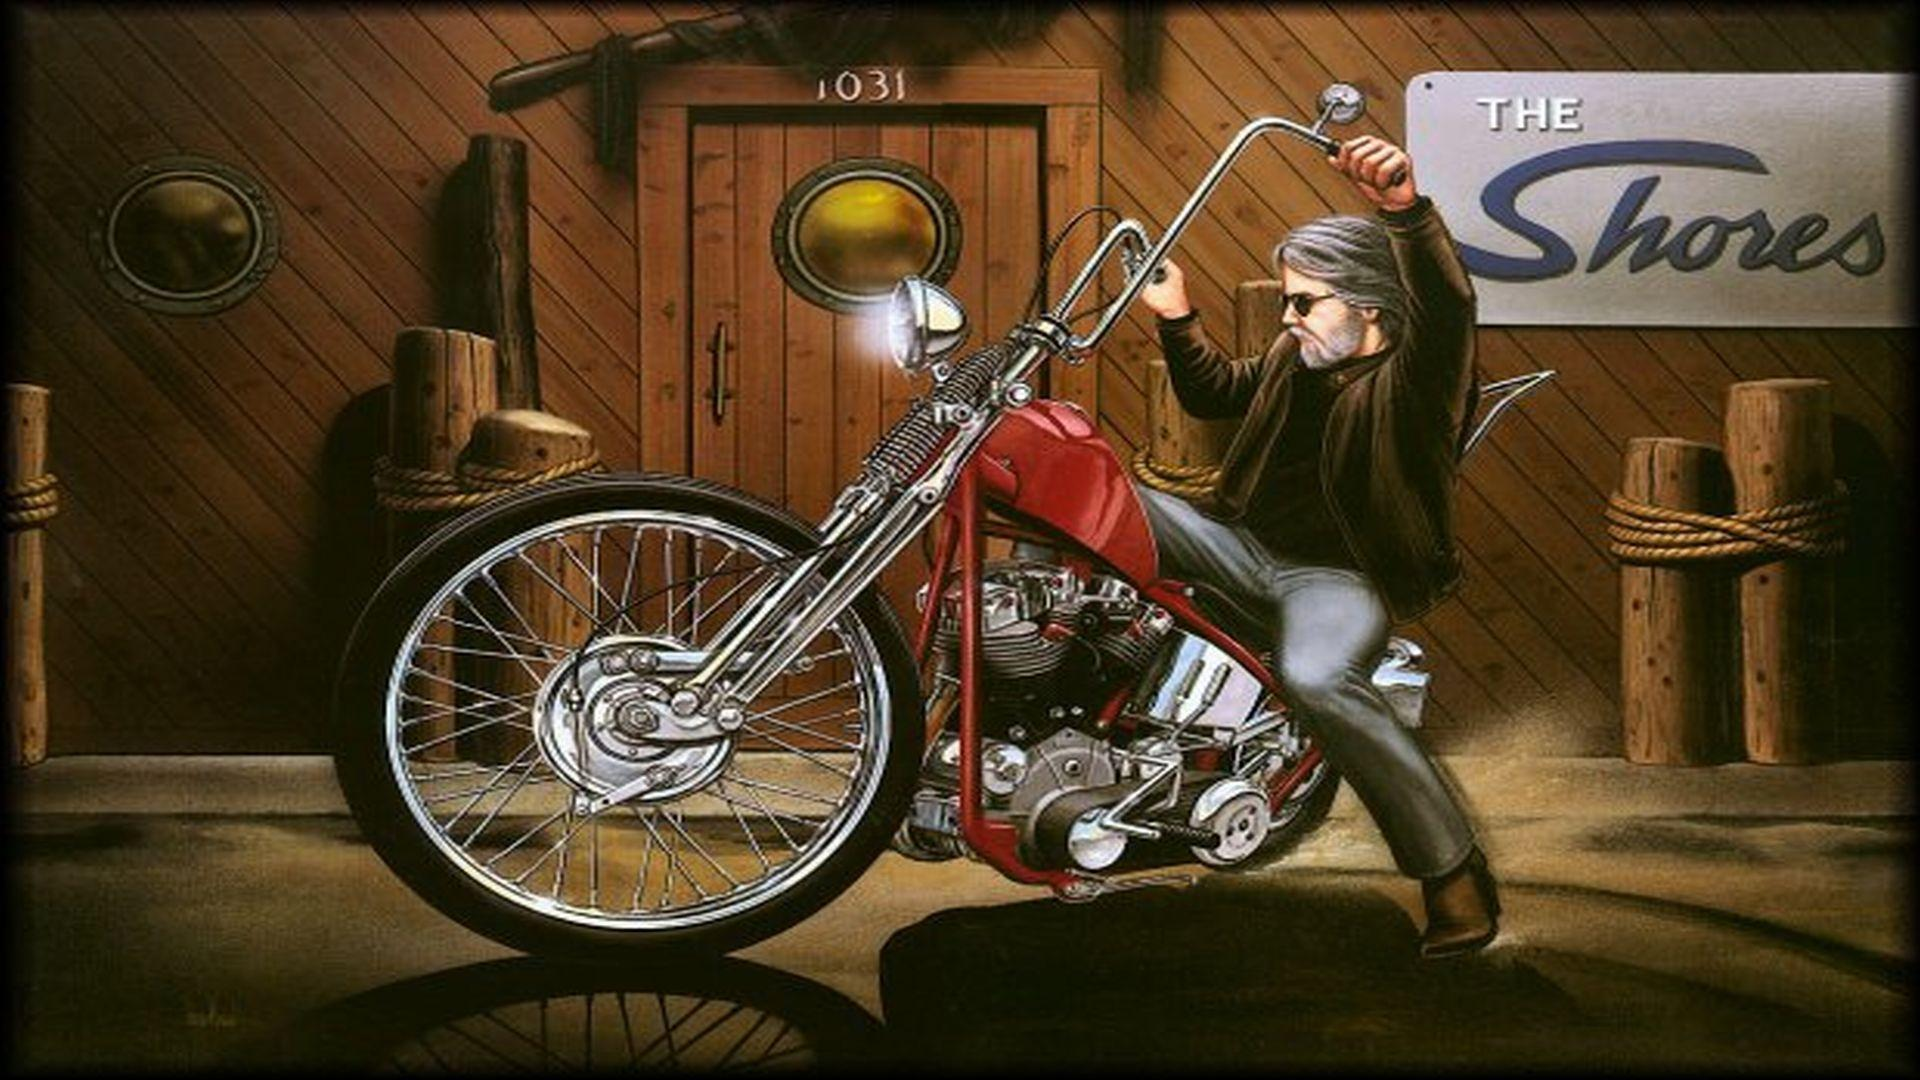 David Mann Wallpapers 1920x1080